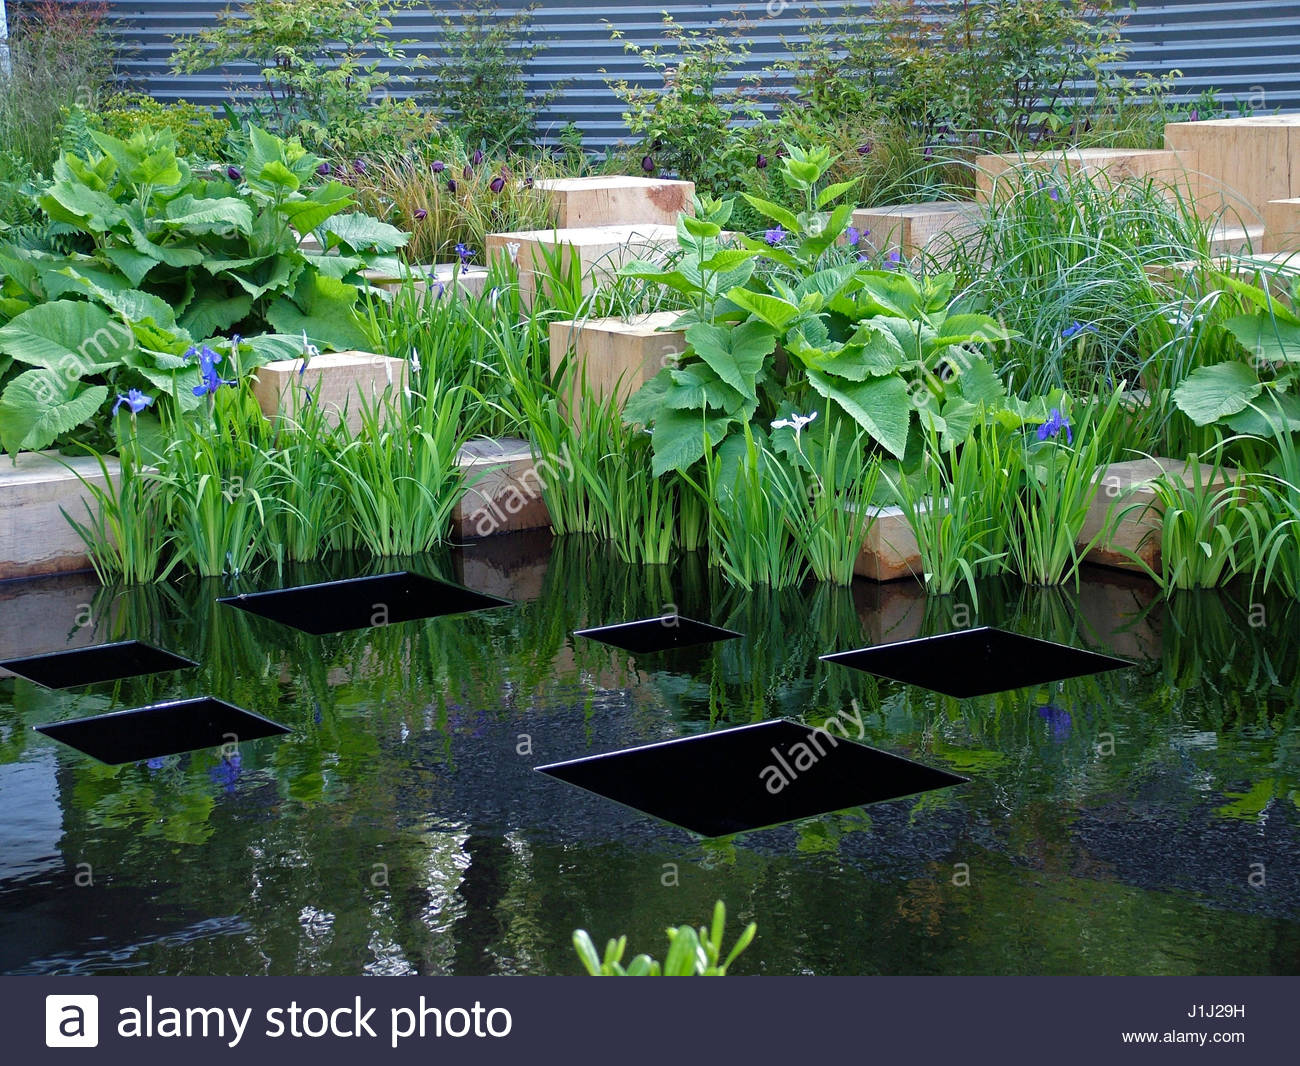 Merrill lynch stock photos merrill lynch stock images alamy for Lynch s garden center